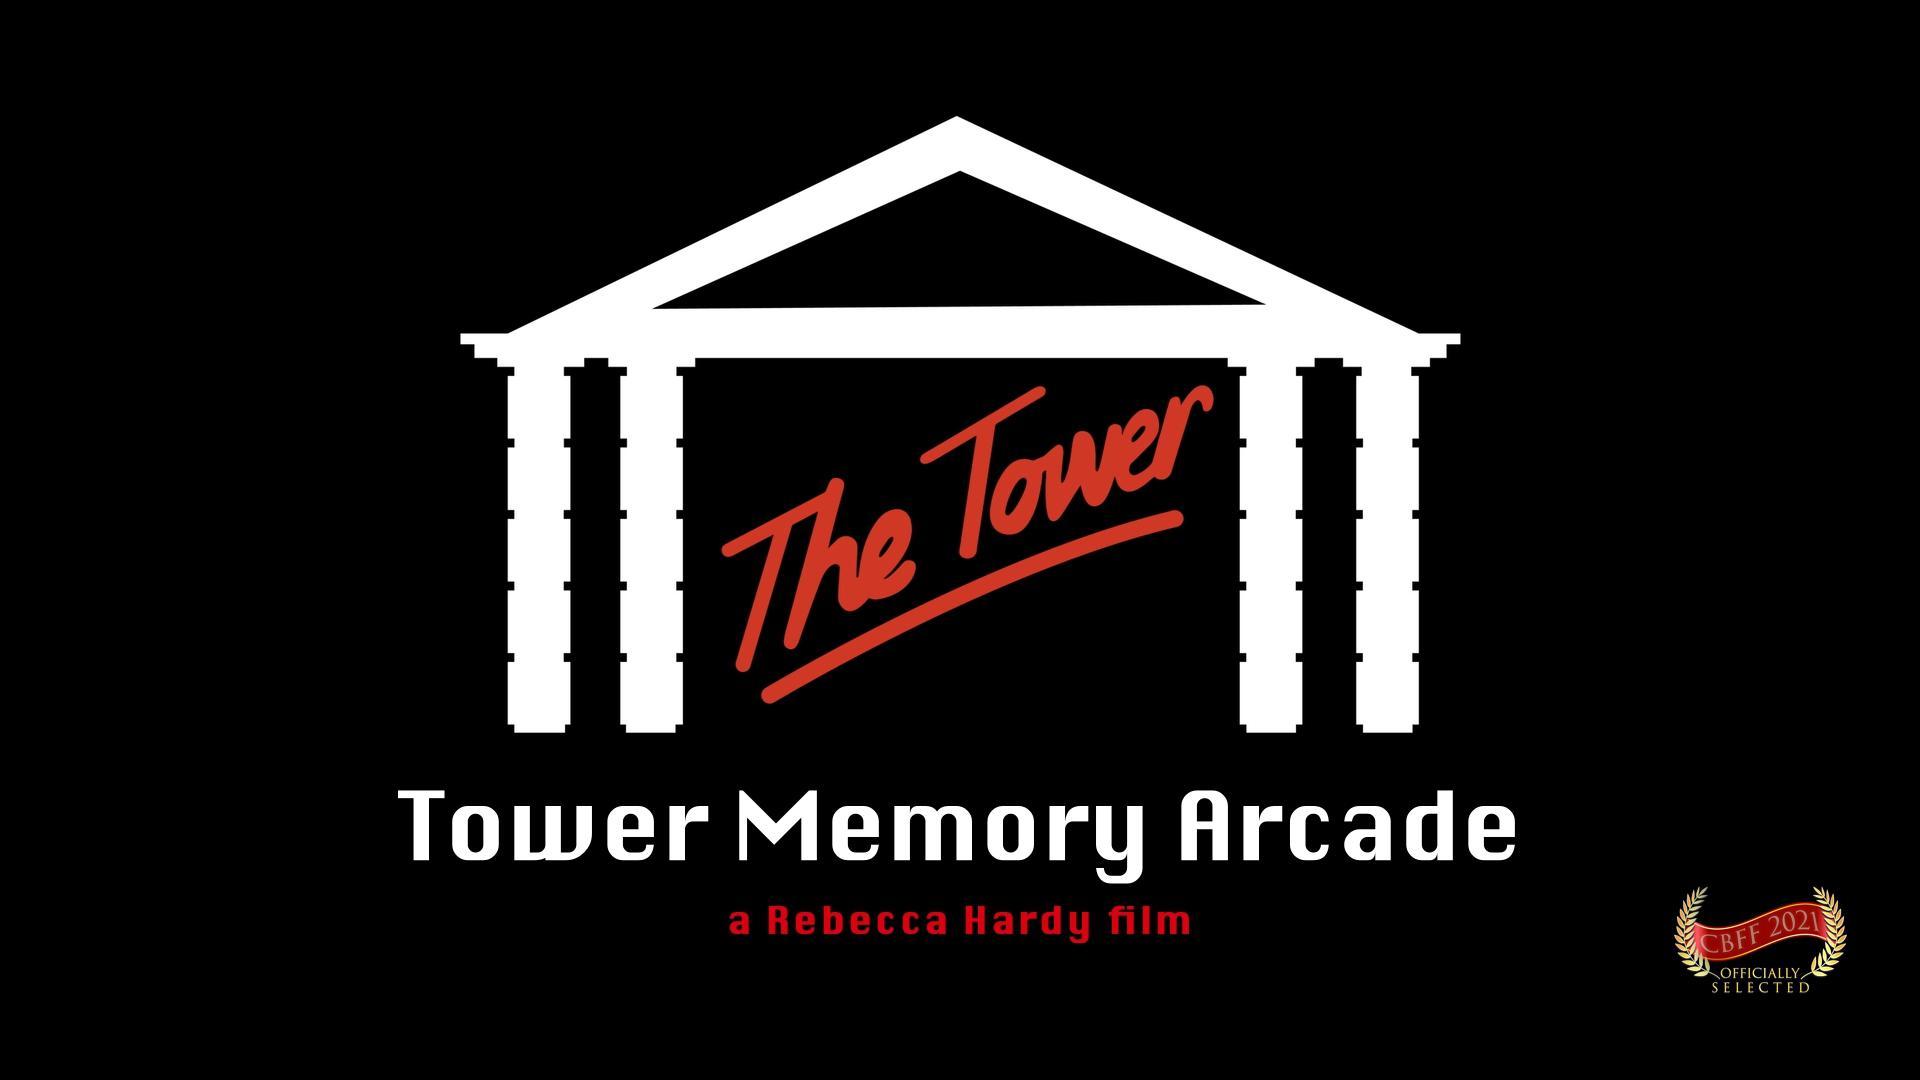 Tower Memory Arcade